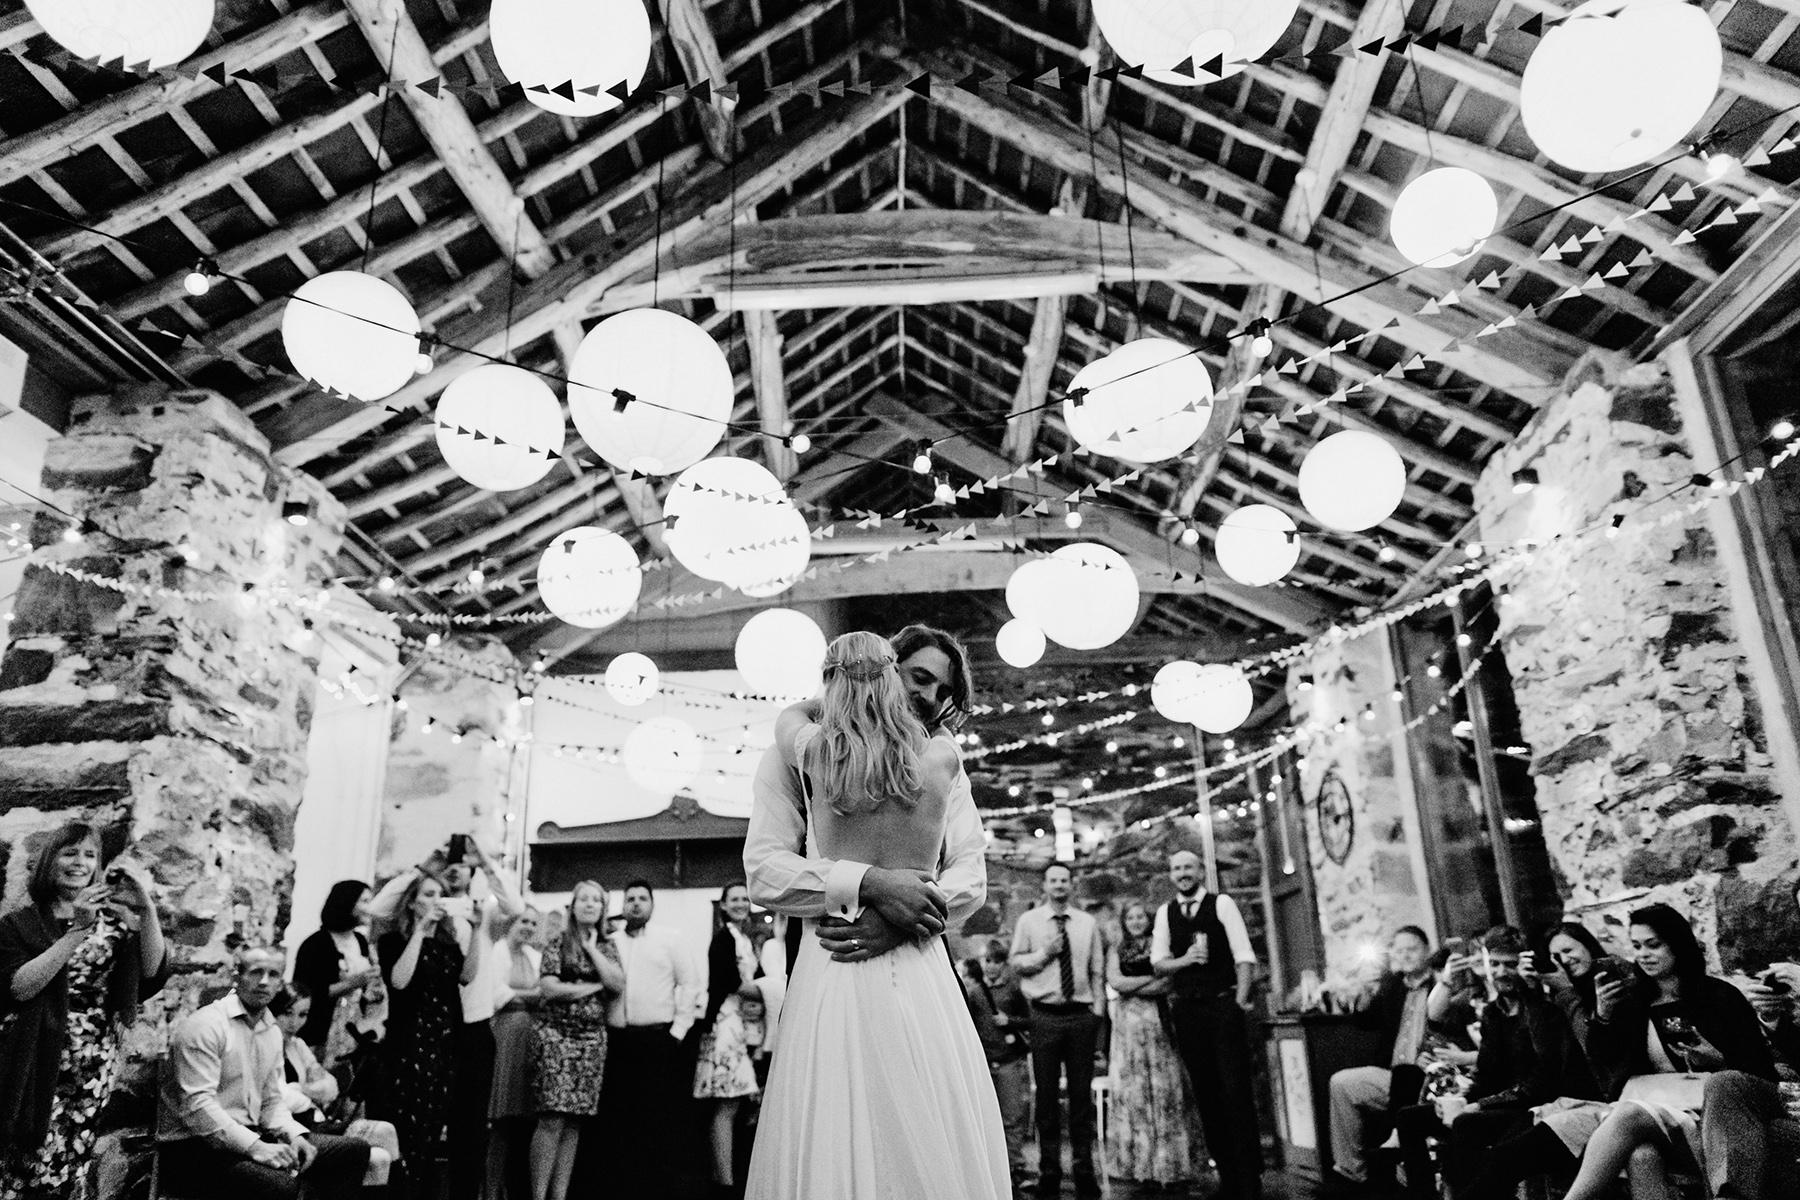 Snowdonia-Wales-Wedding-Photos-0401.jpg